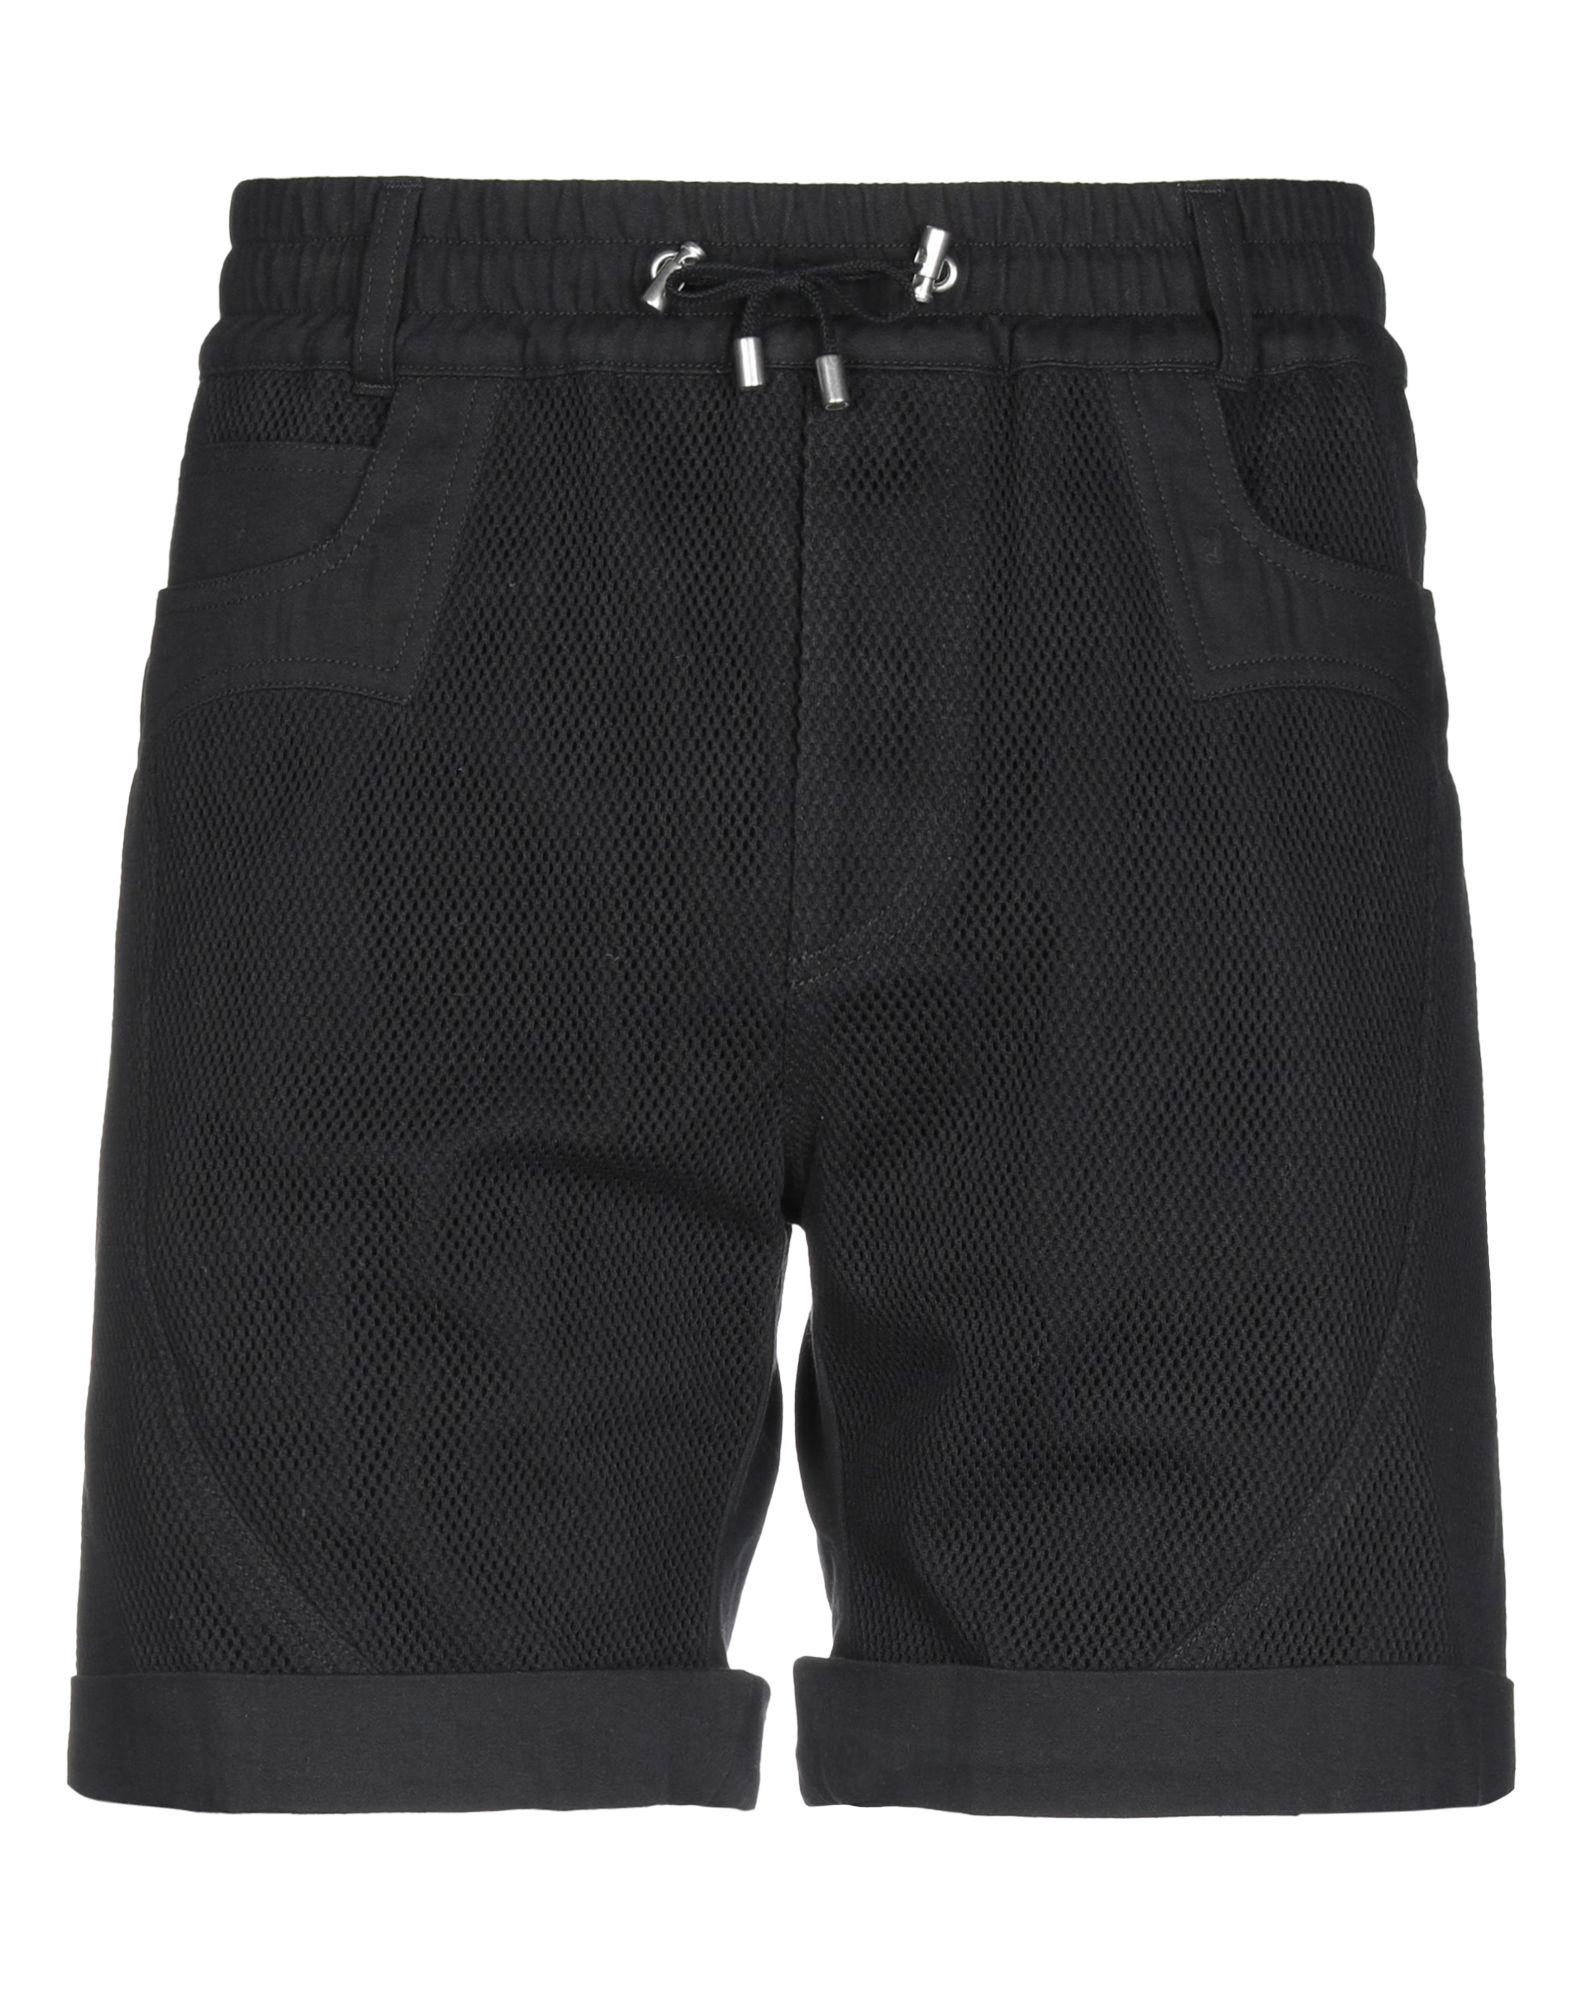 BALMAIN Bermudas. plain weave, jersey, no appliqués, low waisted, comfort fit, tapered leg, drawstring closure, multipockets, basic solid color. 100% Cotton